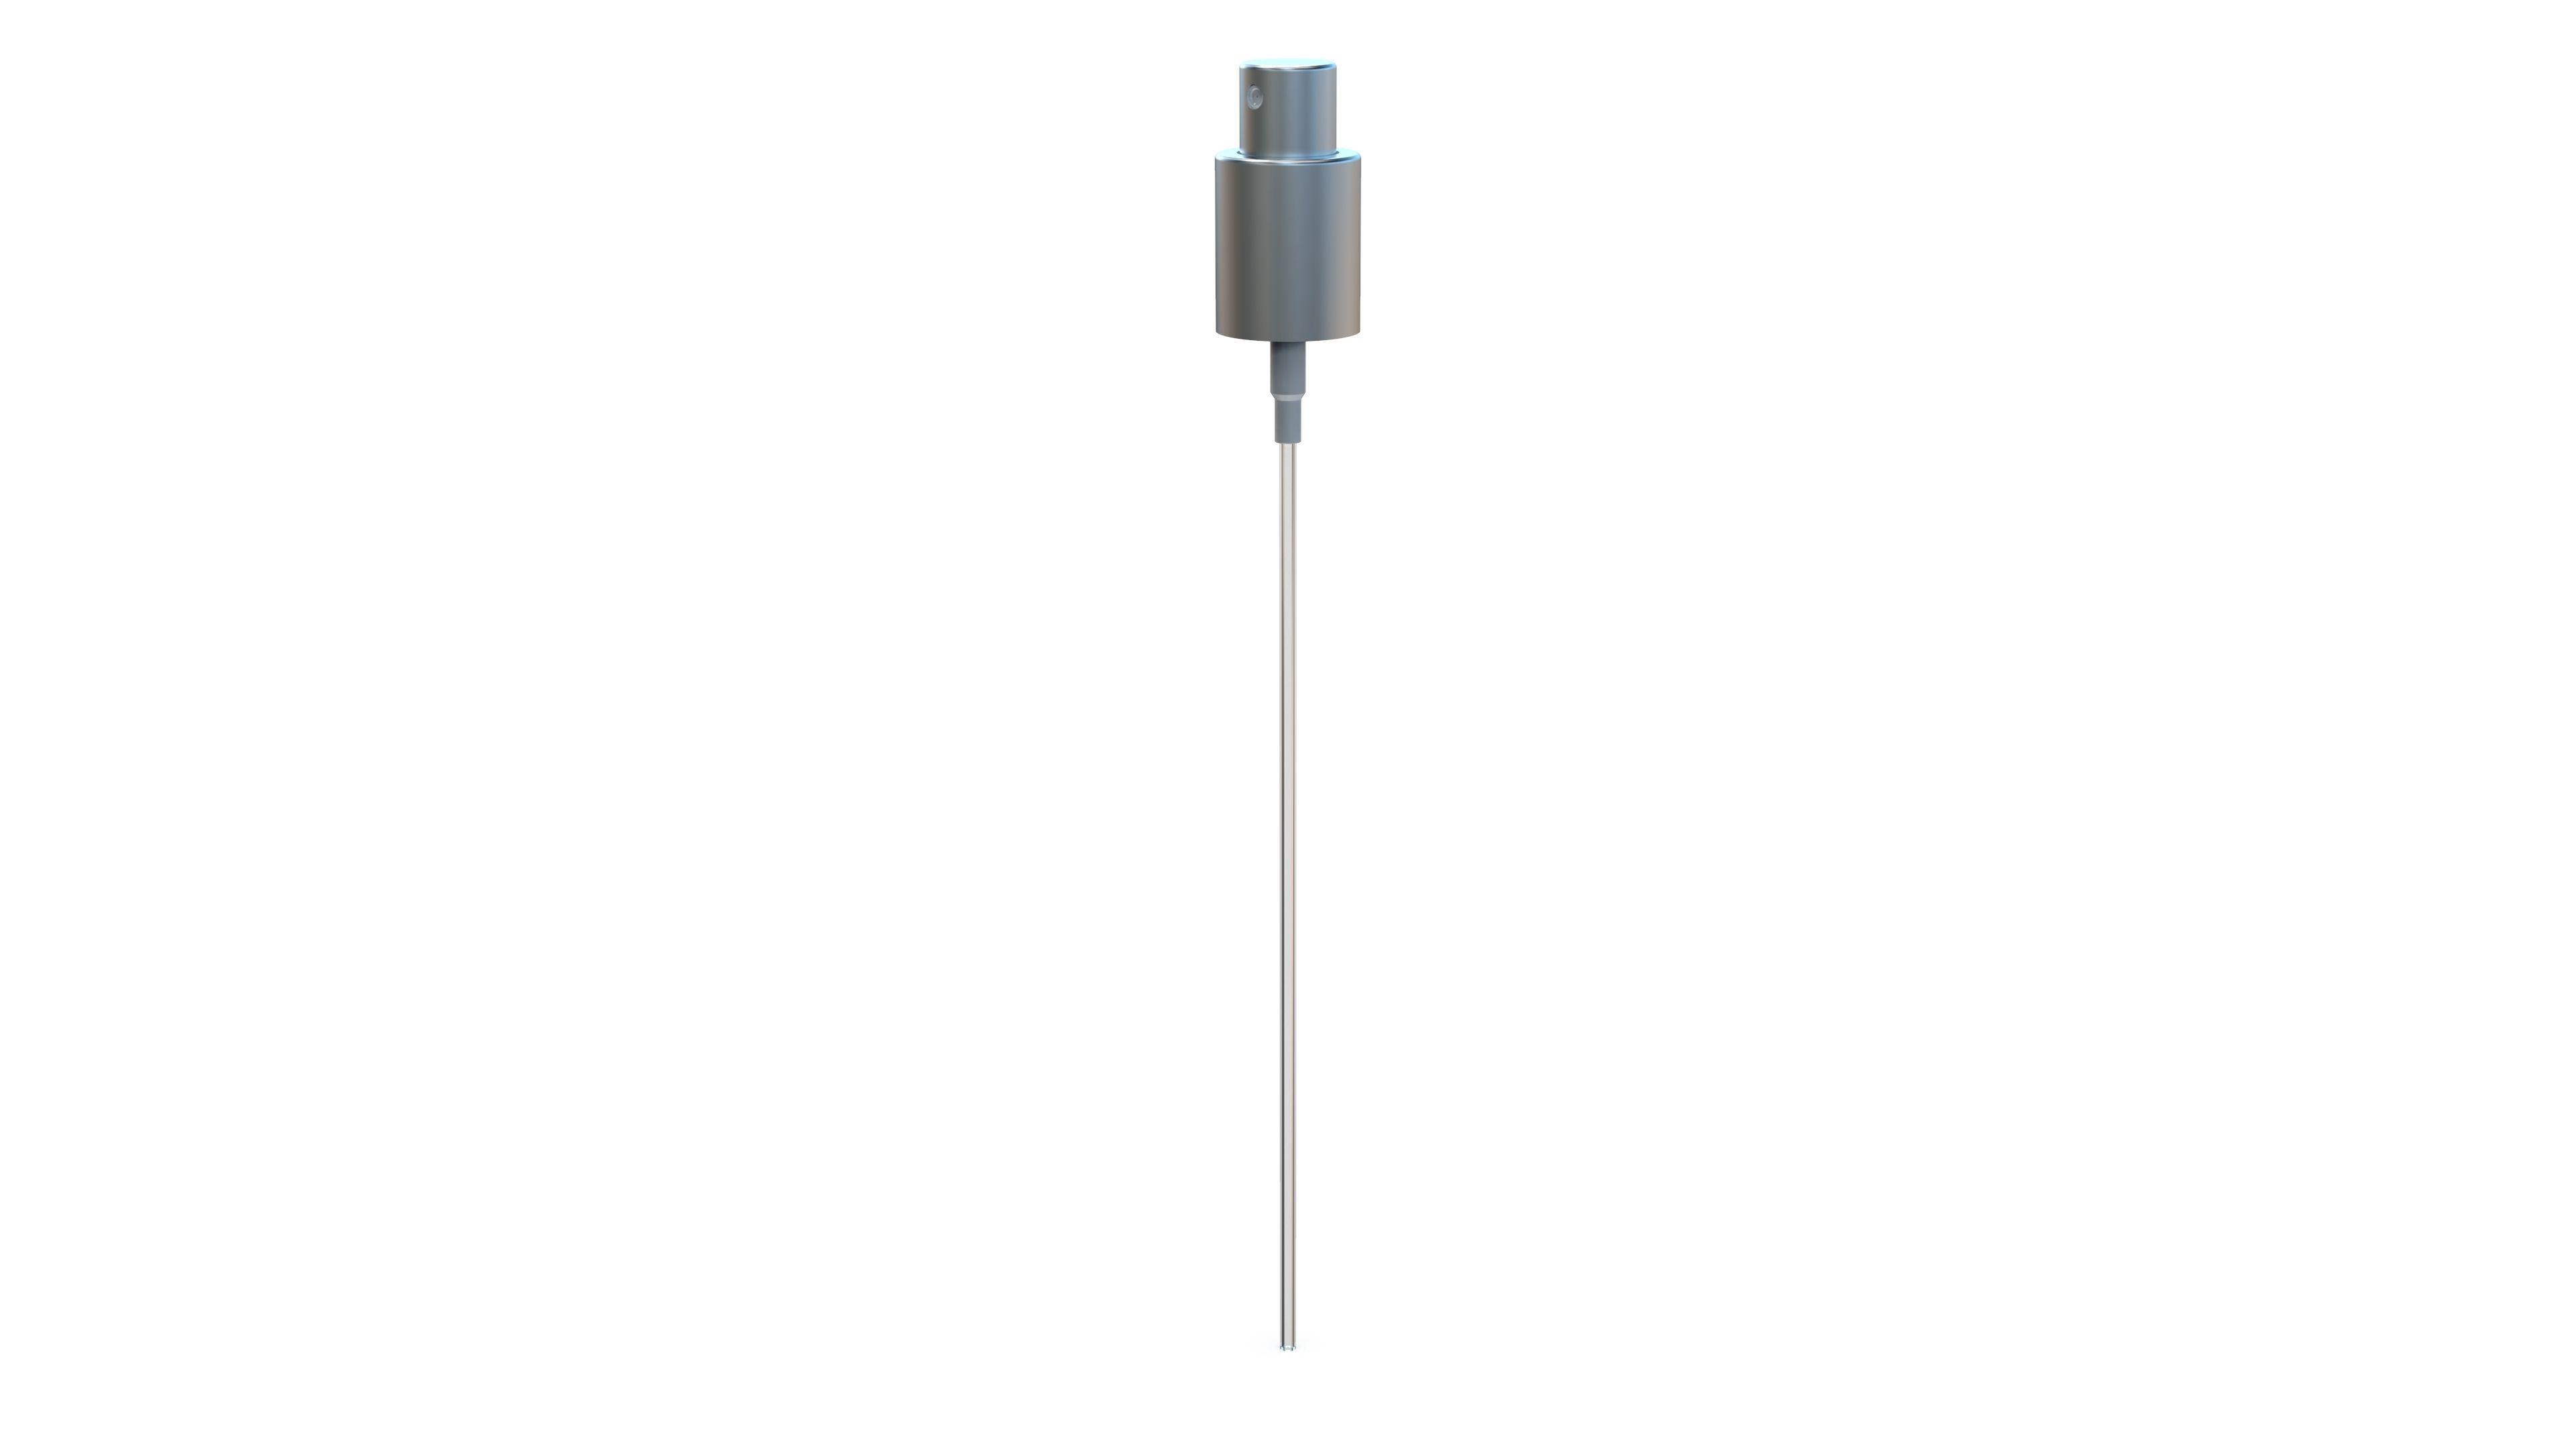 Spray pump - L pipe - 150 mm - Thread SP-415-18 - SP-03-02-00 AL